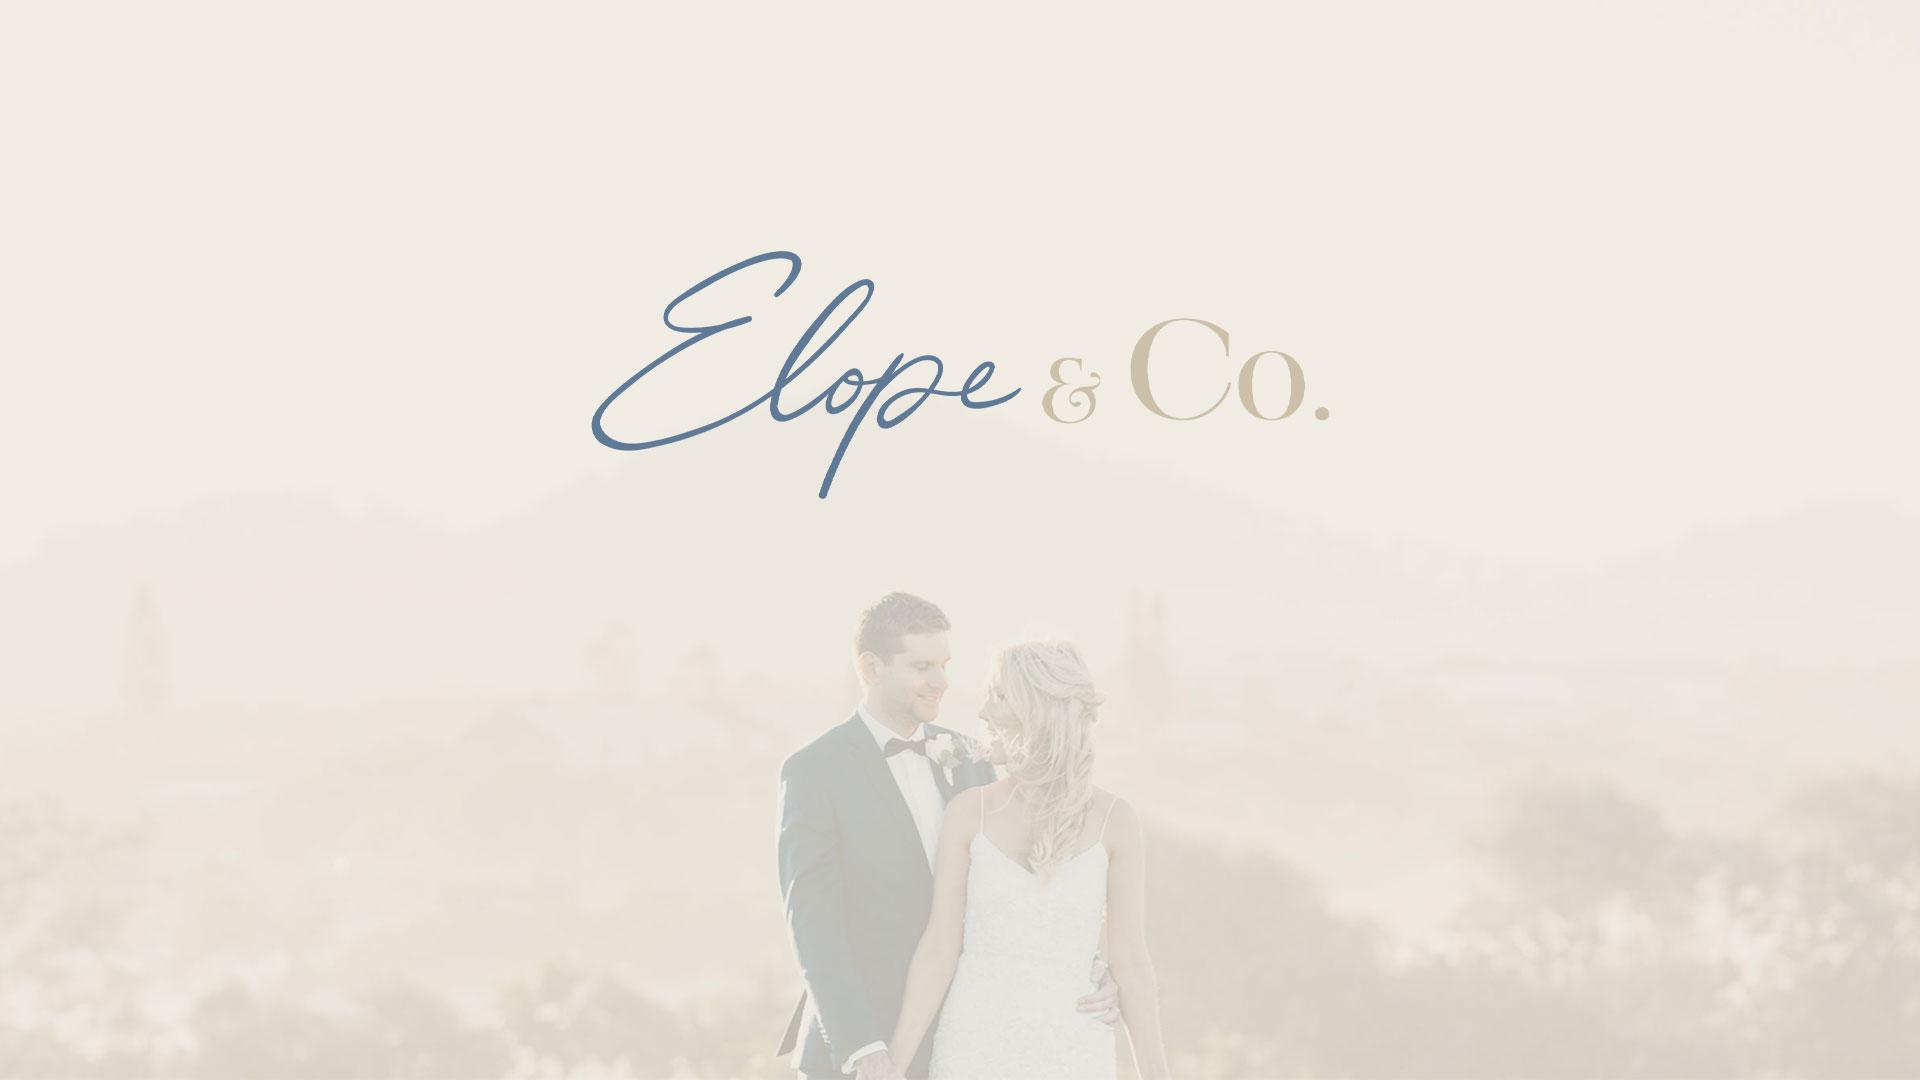 Elope & Co